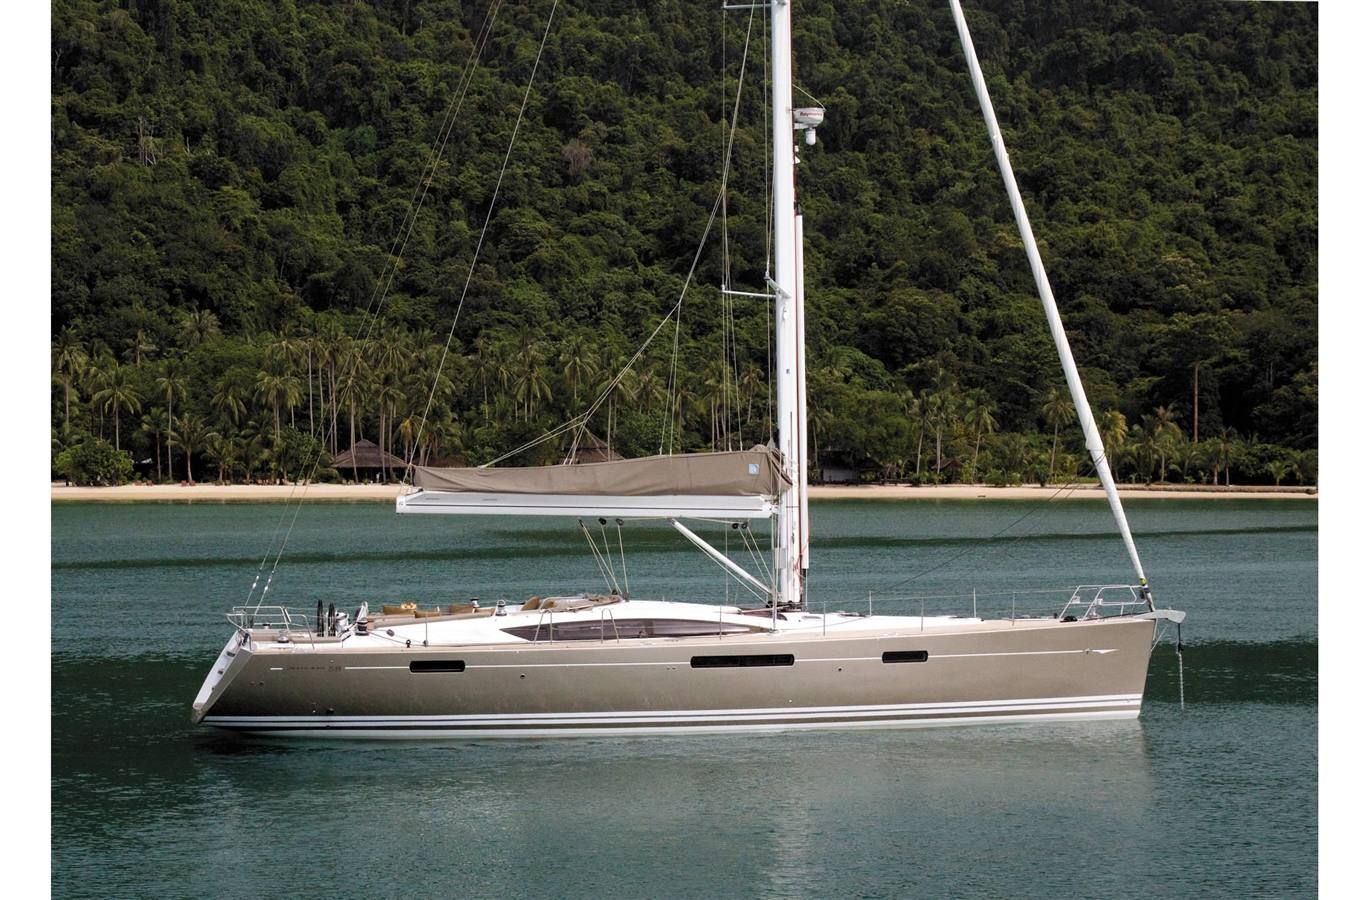 2019 Jeanneau Jeanneau 58 - Sara Bay Marina